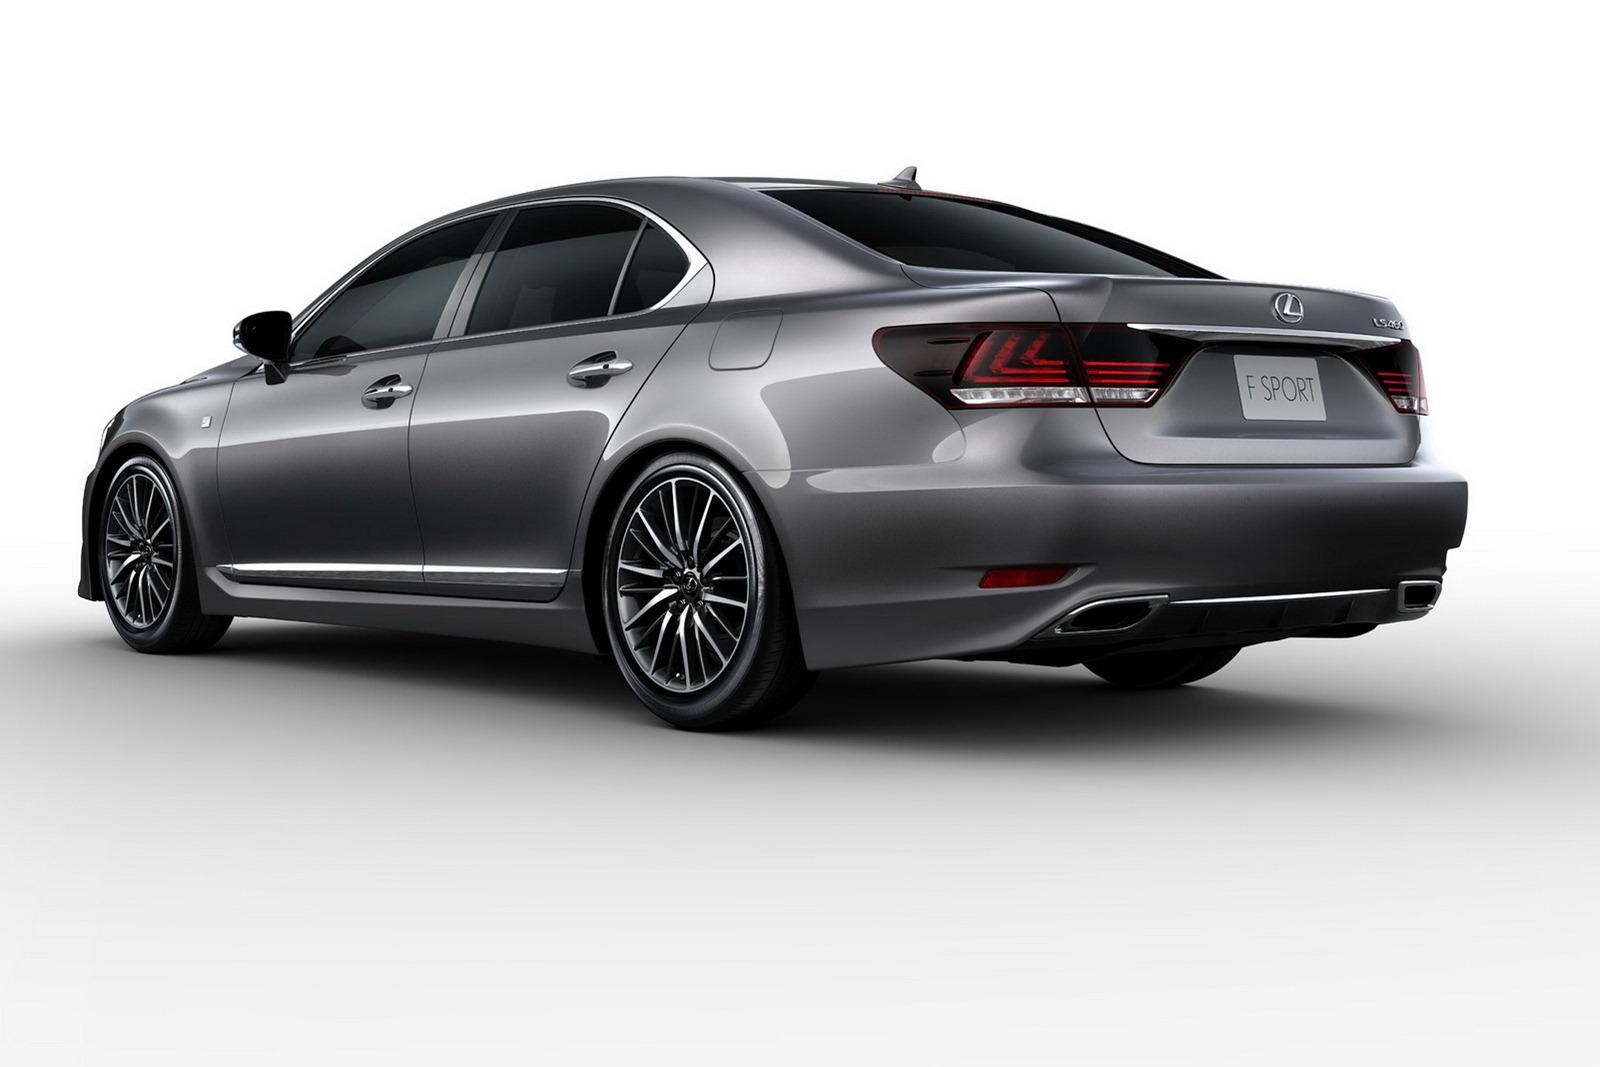 nancys car designs 2013 lexus ls 460 f sport. Black Bedroom Furniture Sets. Home Design Ideas